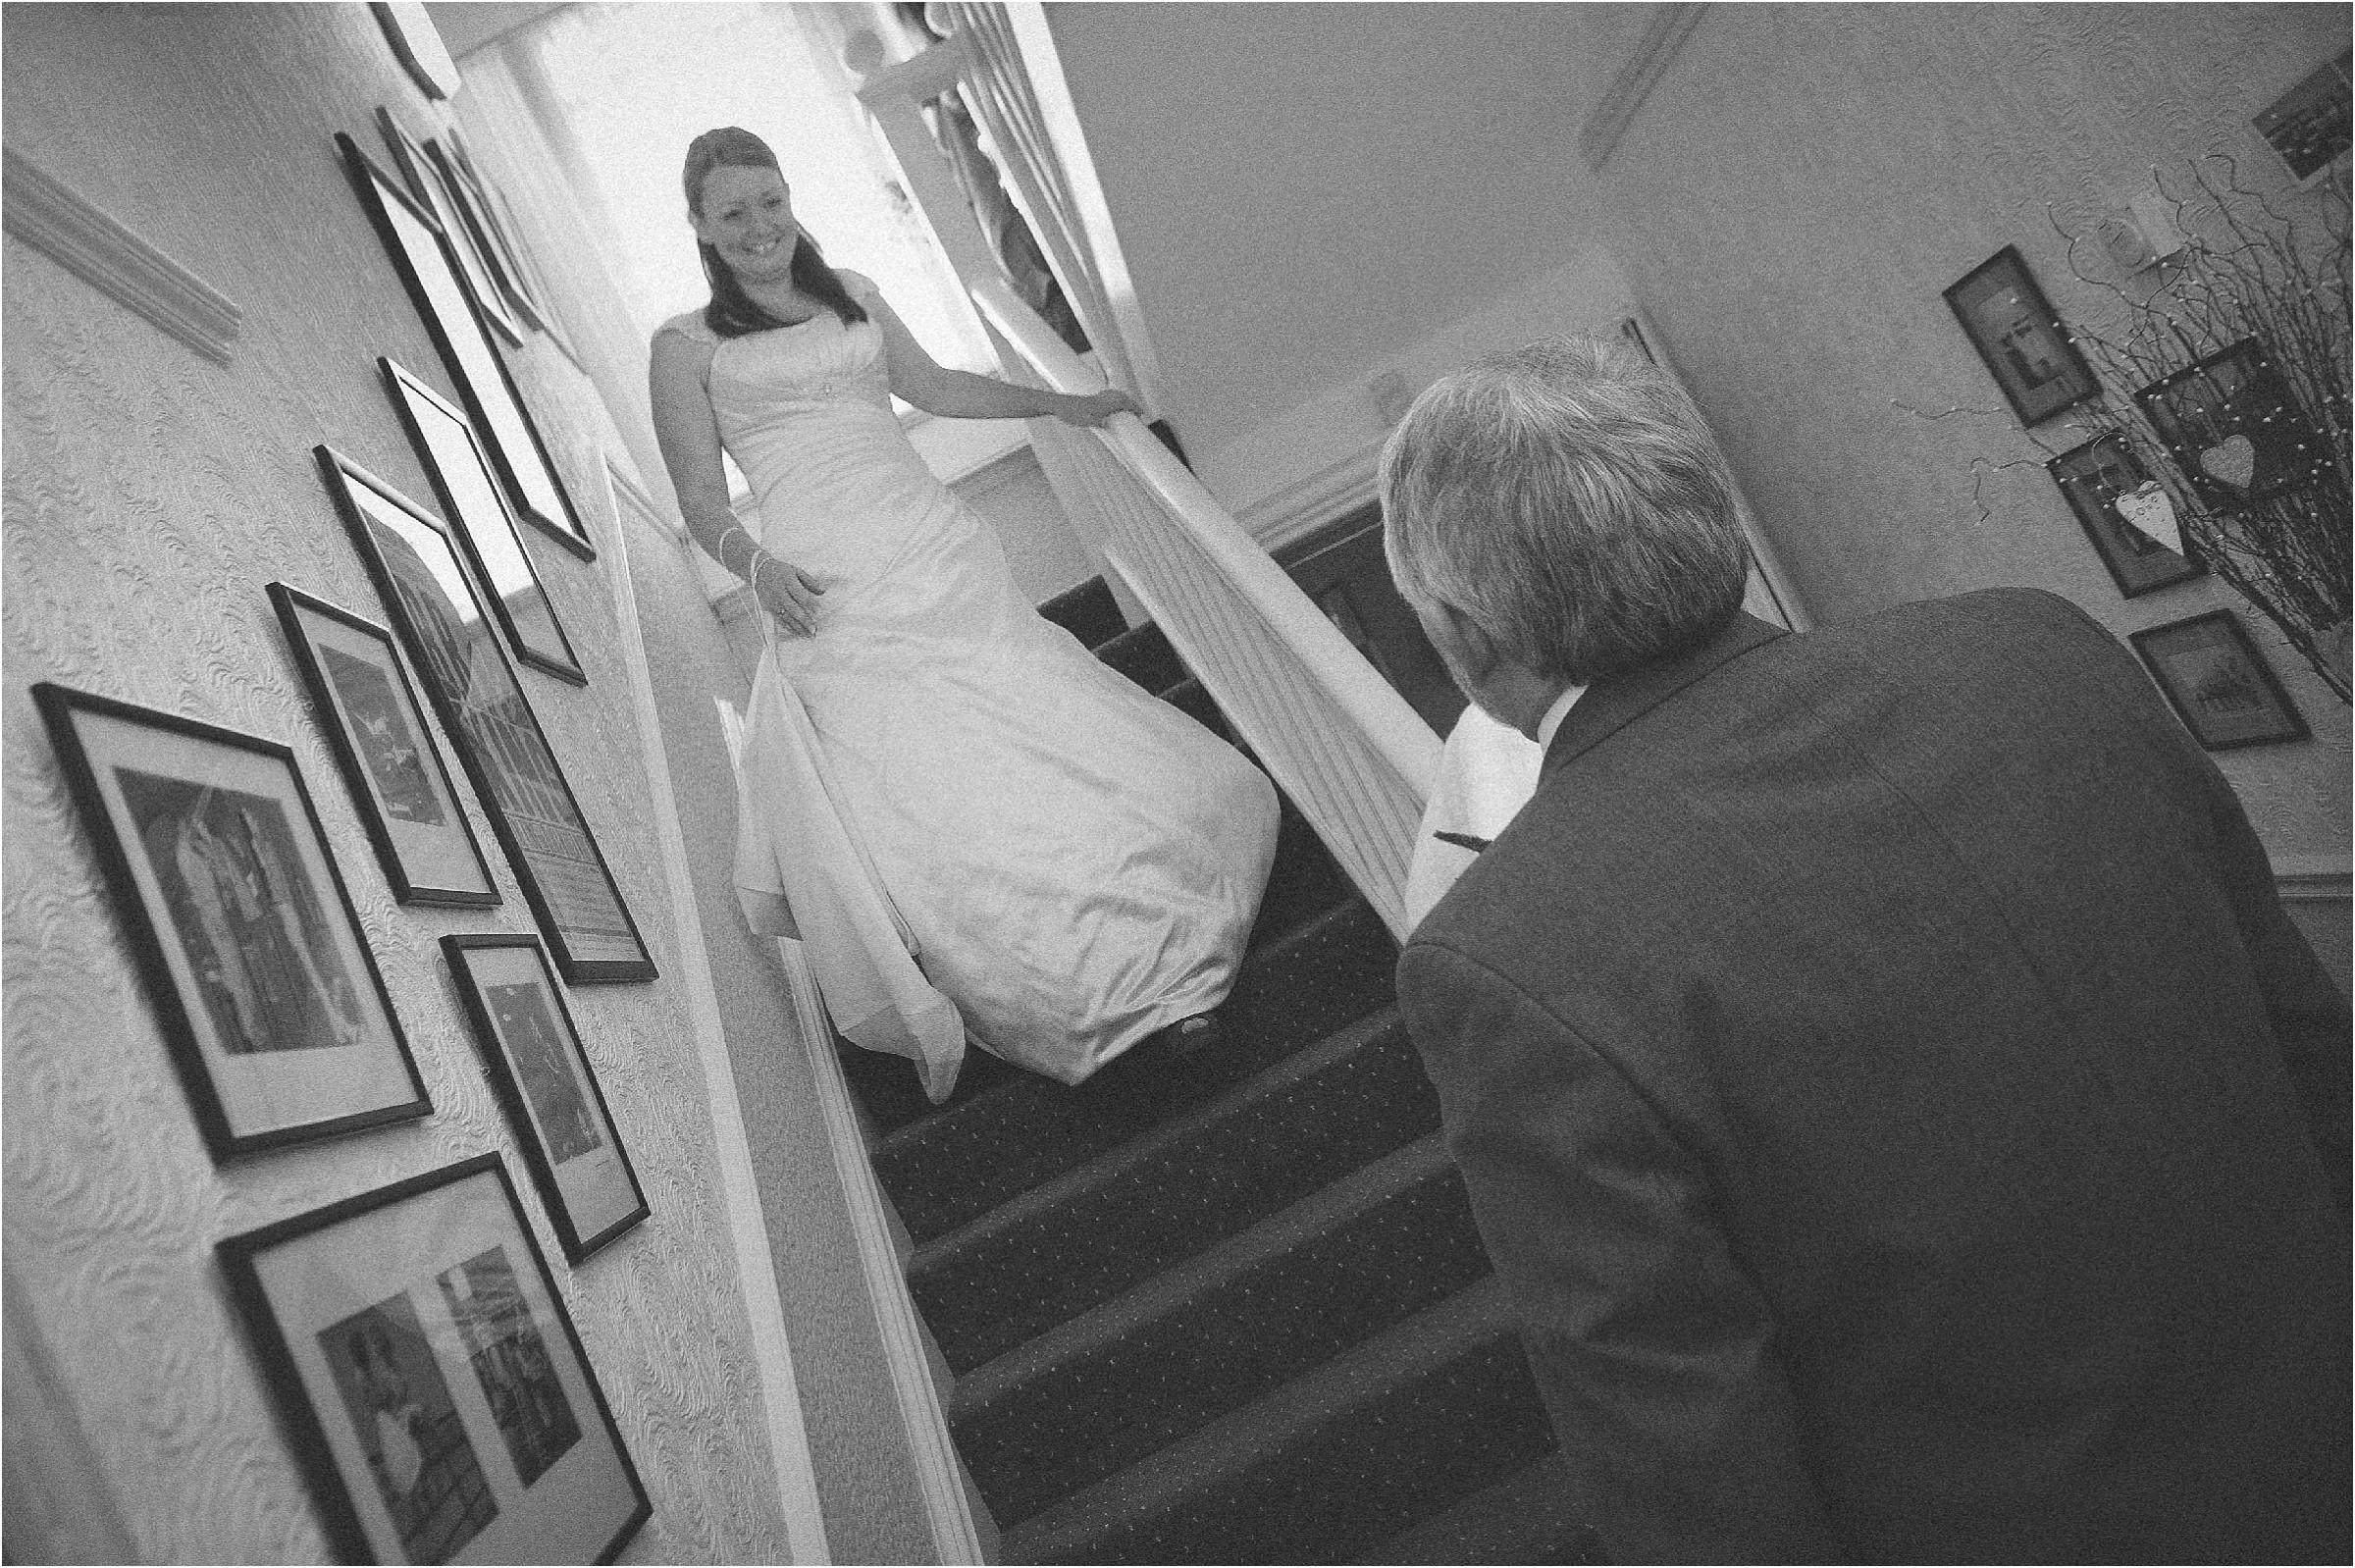 011 wedding photography doxford hall northumberlandDSC_0518e